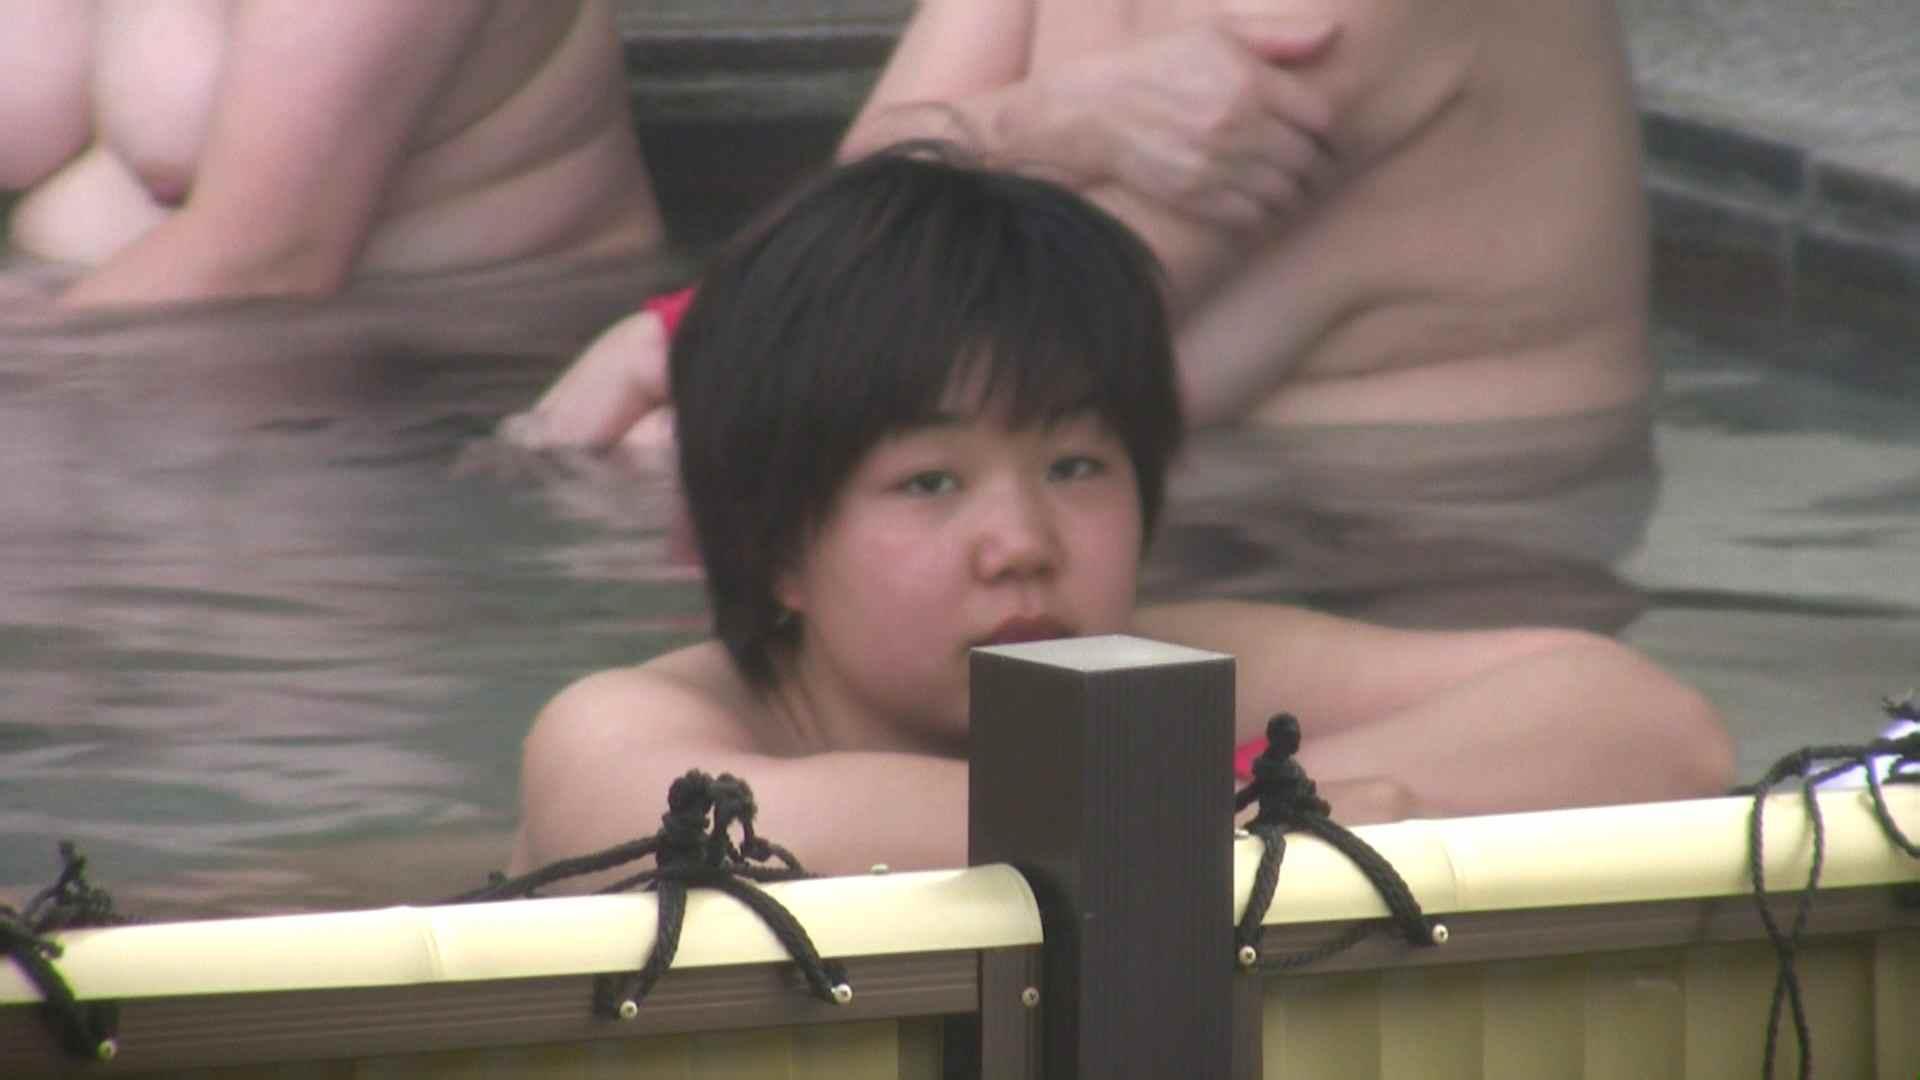 Aquaな露天風呂Vol.53【VIP限定】 盗撮師作品 おまんこ動画流出 78pic 56